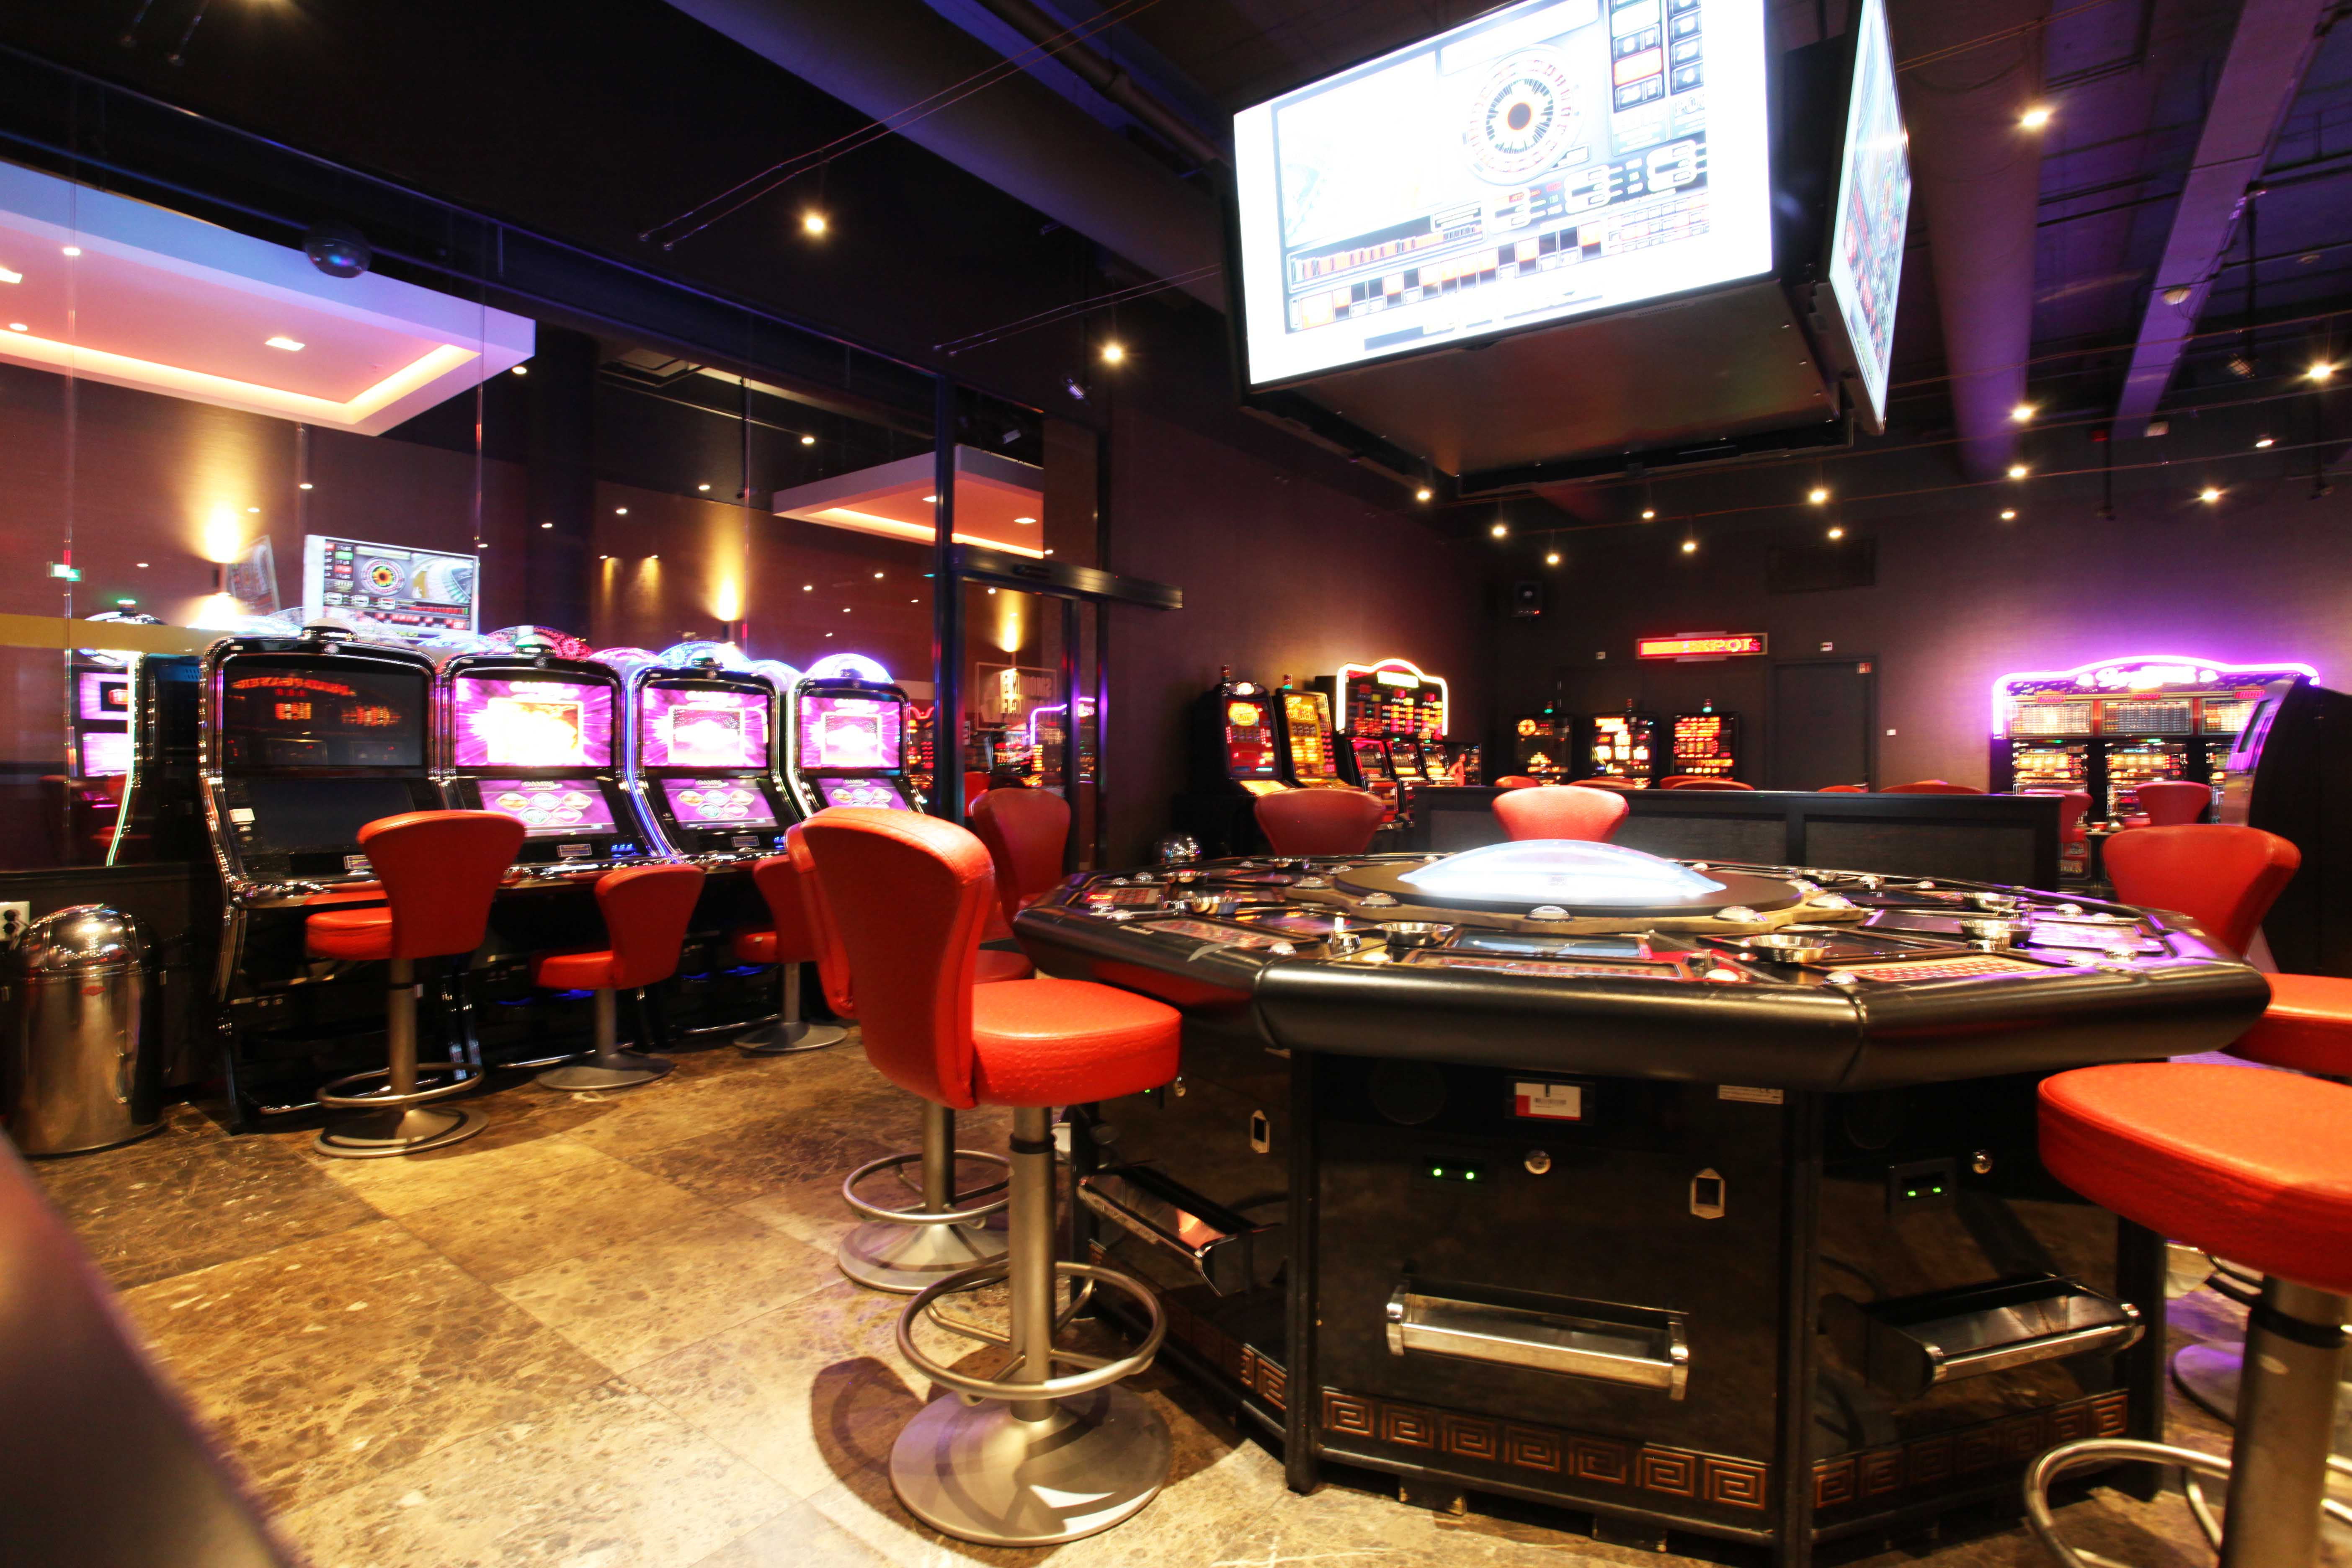 Casino rotterdam alexandrium informatique photo service galerie marchande casino 83210 sollies pont